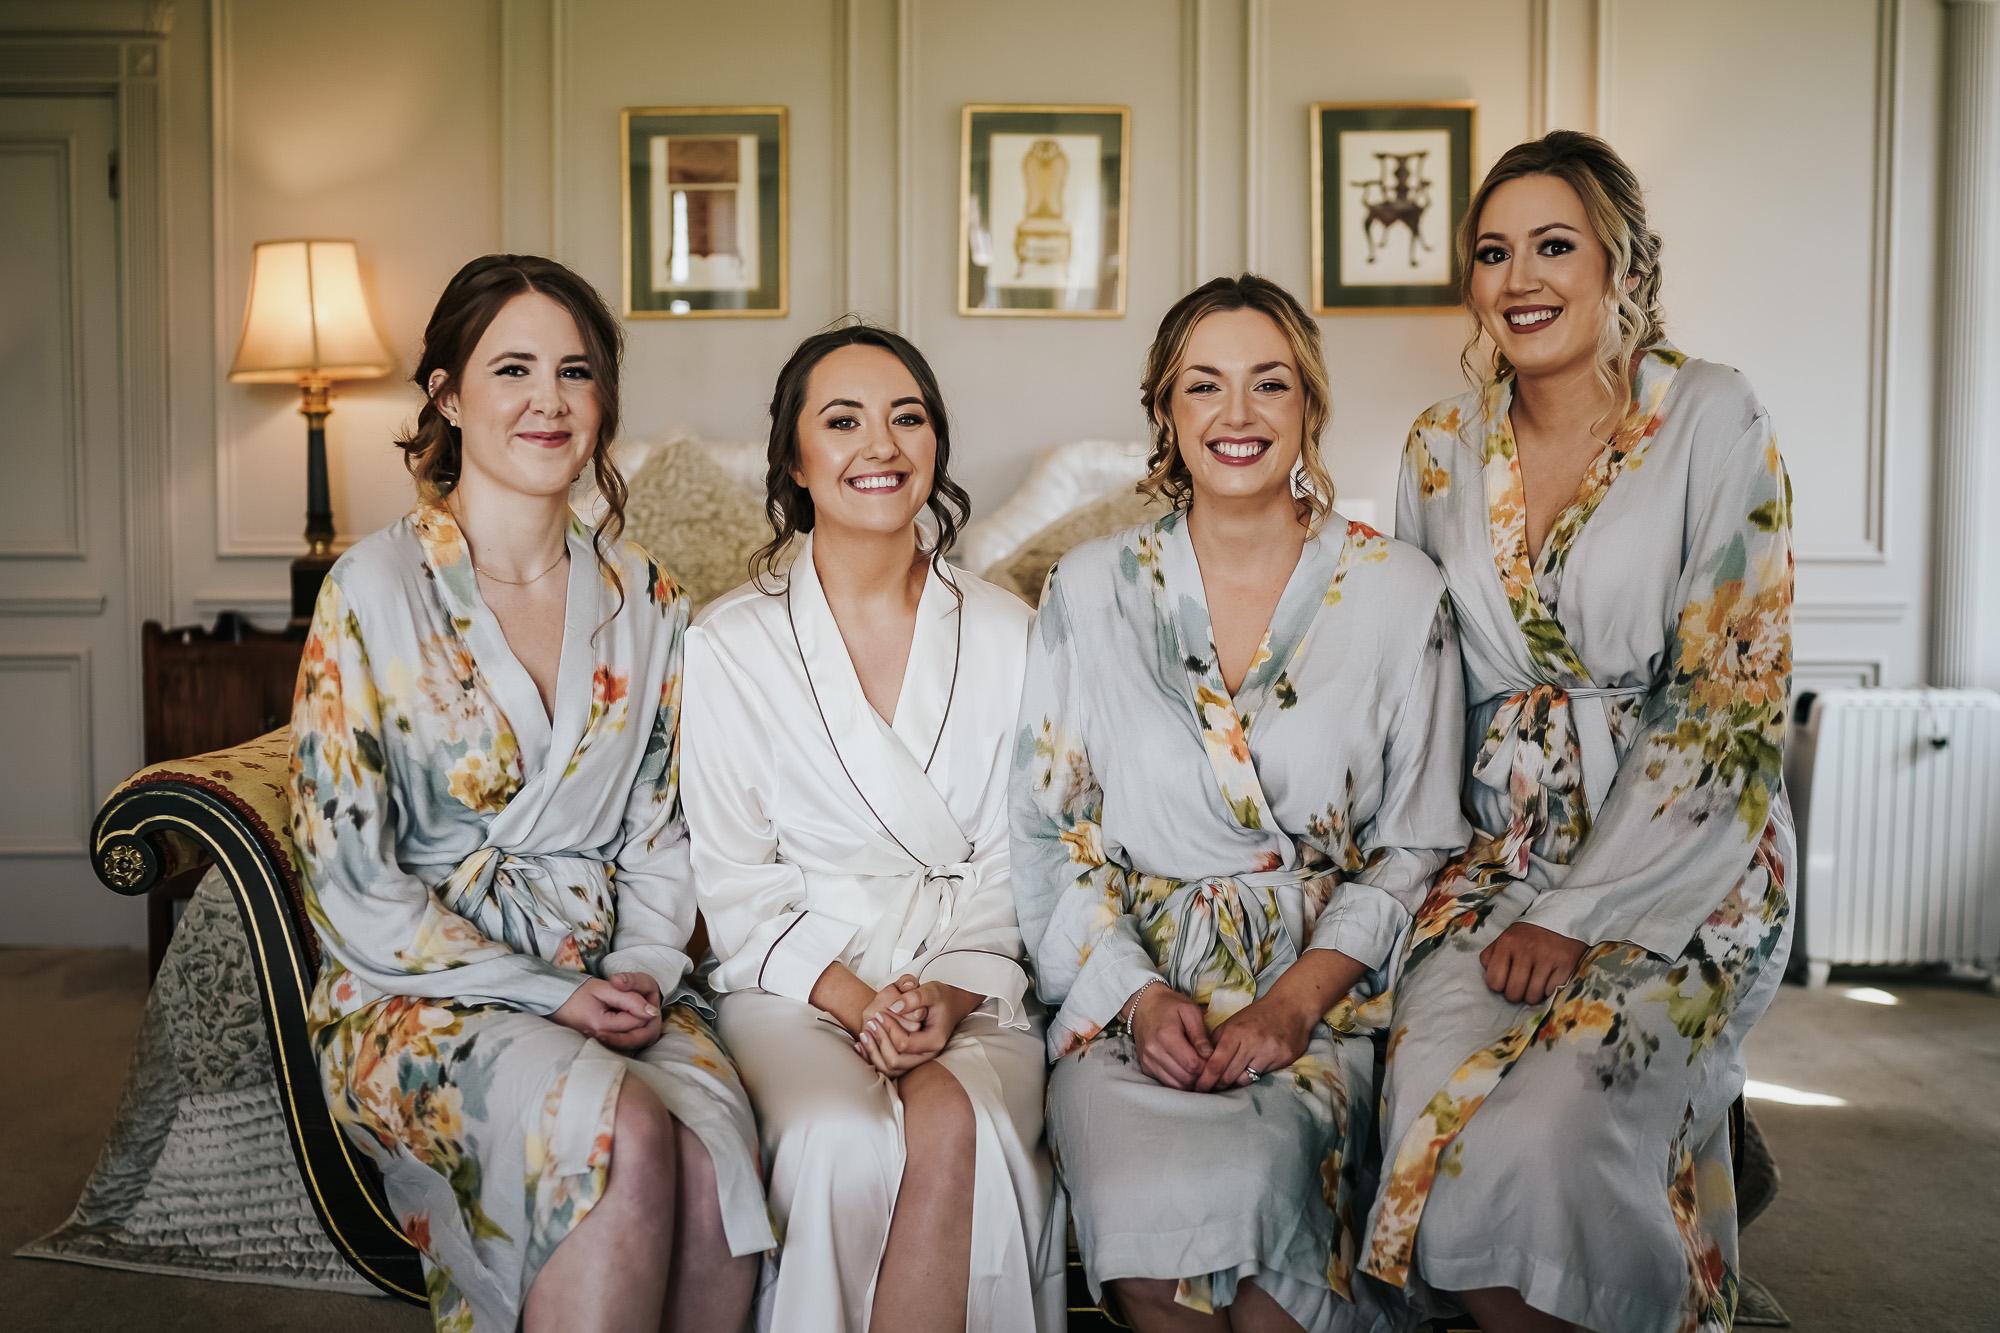 Thornton Manor Cheshire wedding photographer Wedding Photography Cheshire wedding photographer (10 of 64).jpg